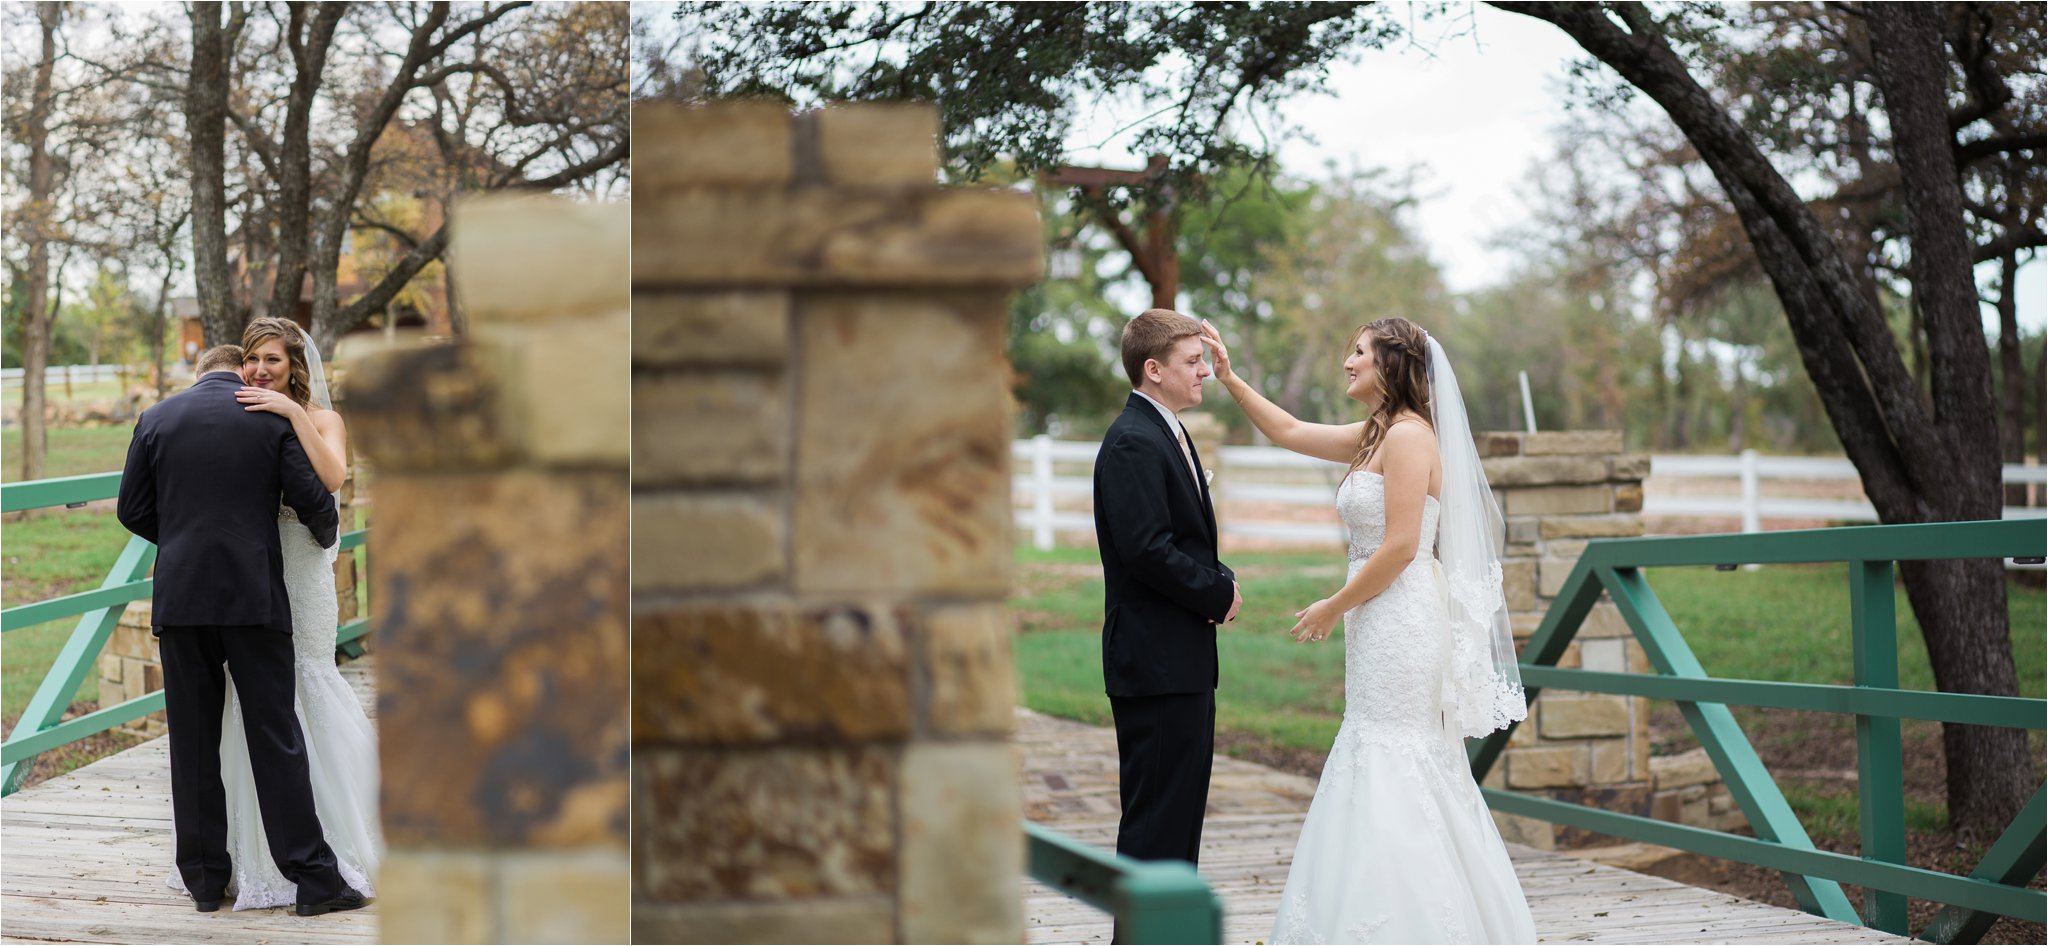 lunsford-wedding-117.jpg